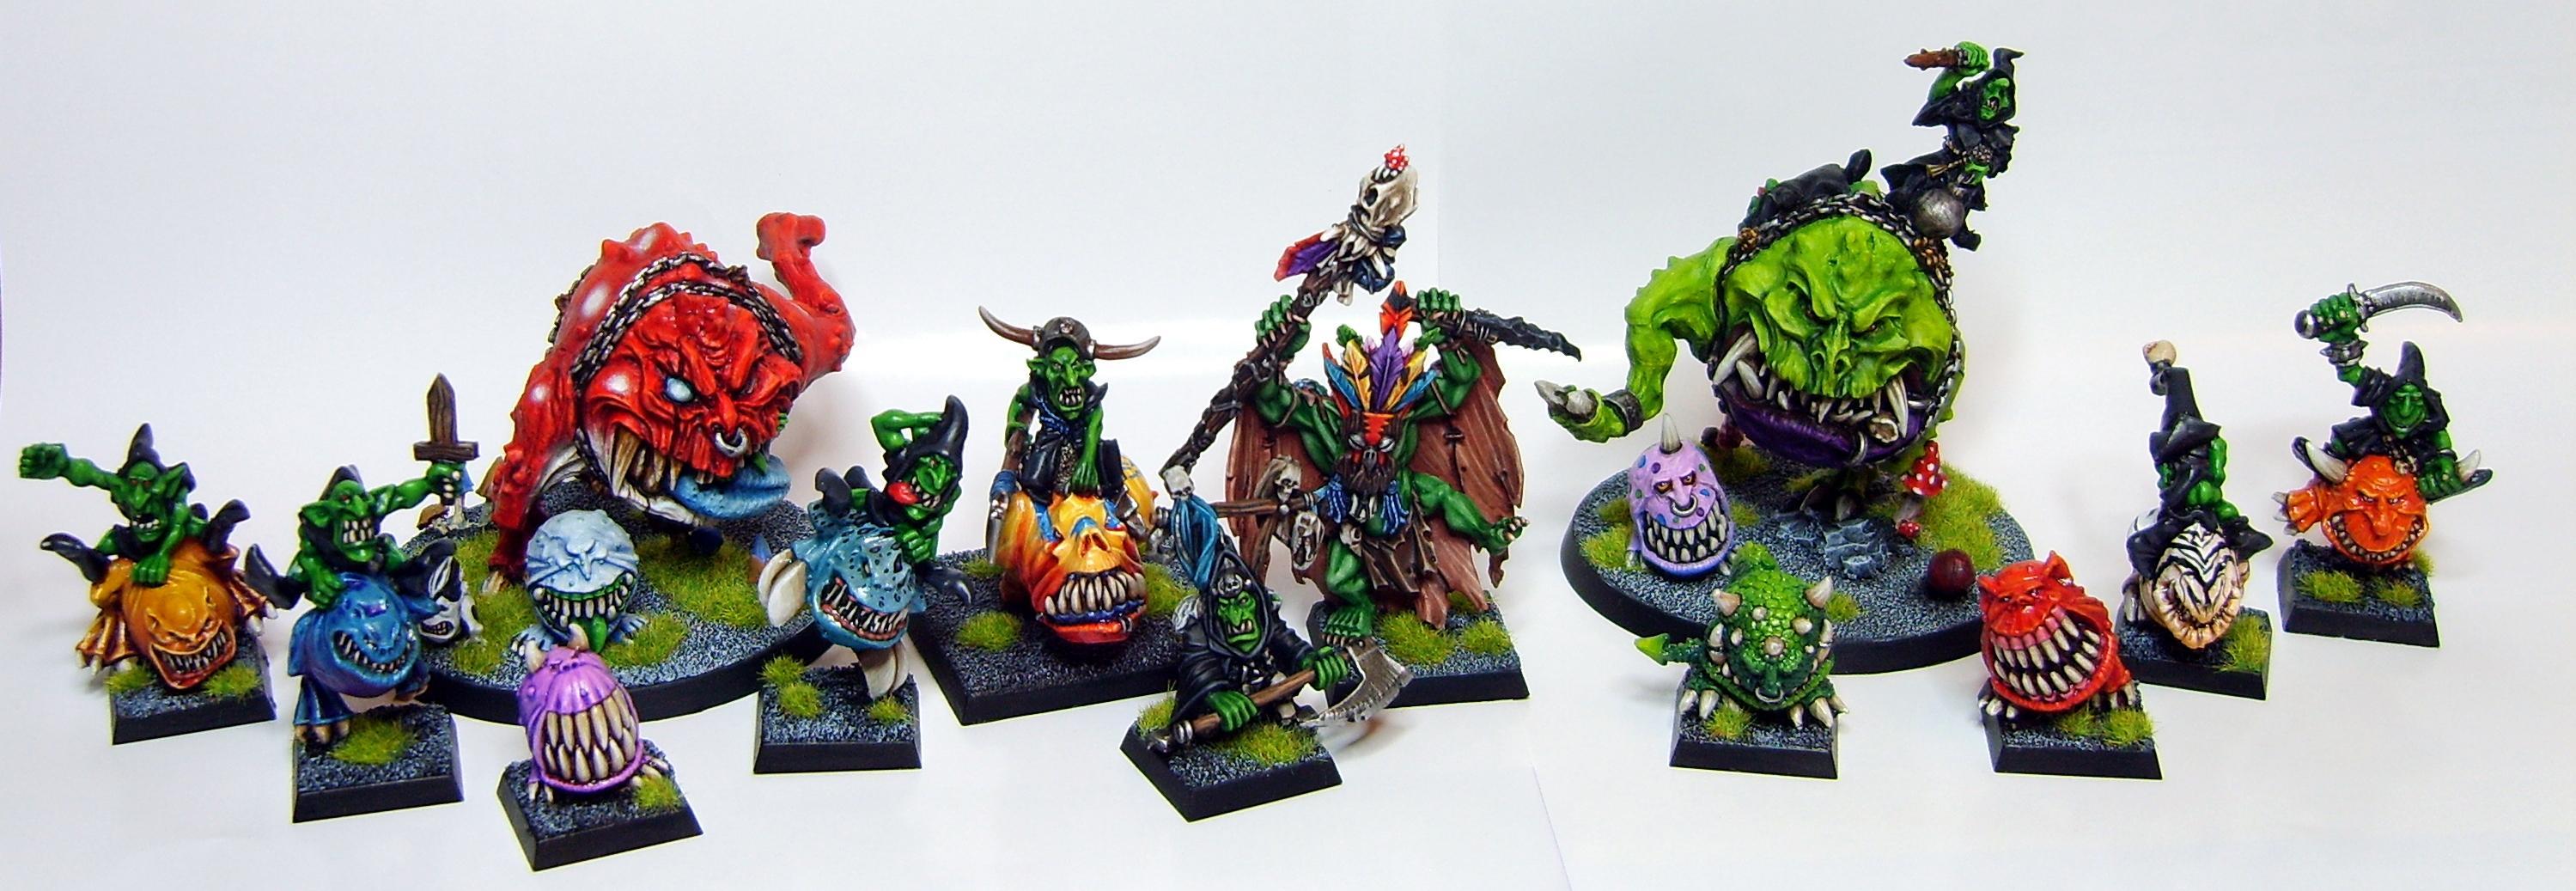 Airbrush, Cave, Gobbo, Goblins, Mangler, Orcs, Orks, Rainbow, Shaman, Squigs, Warhammer Fantasy, Wurrzag